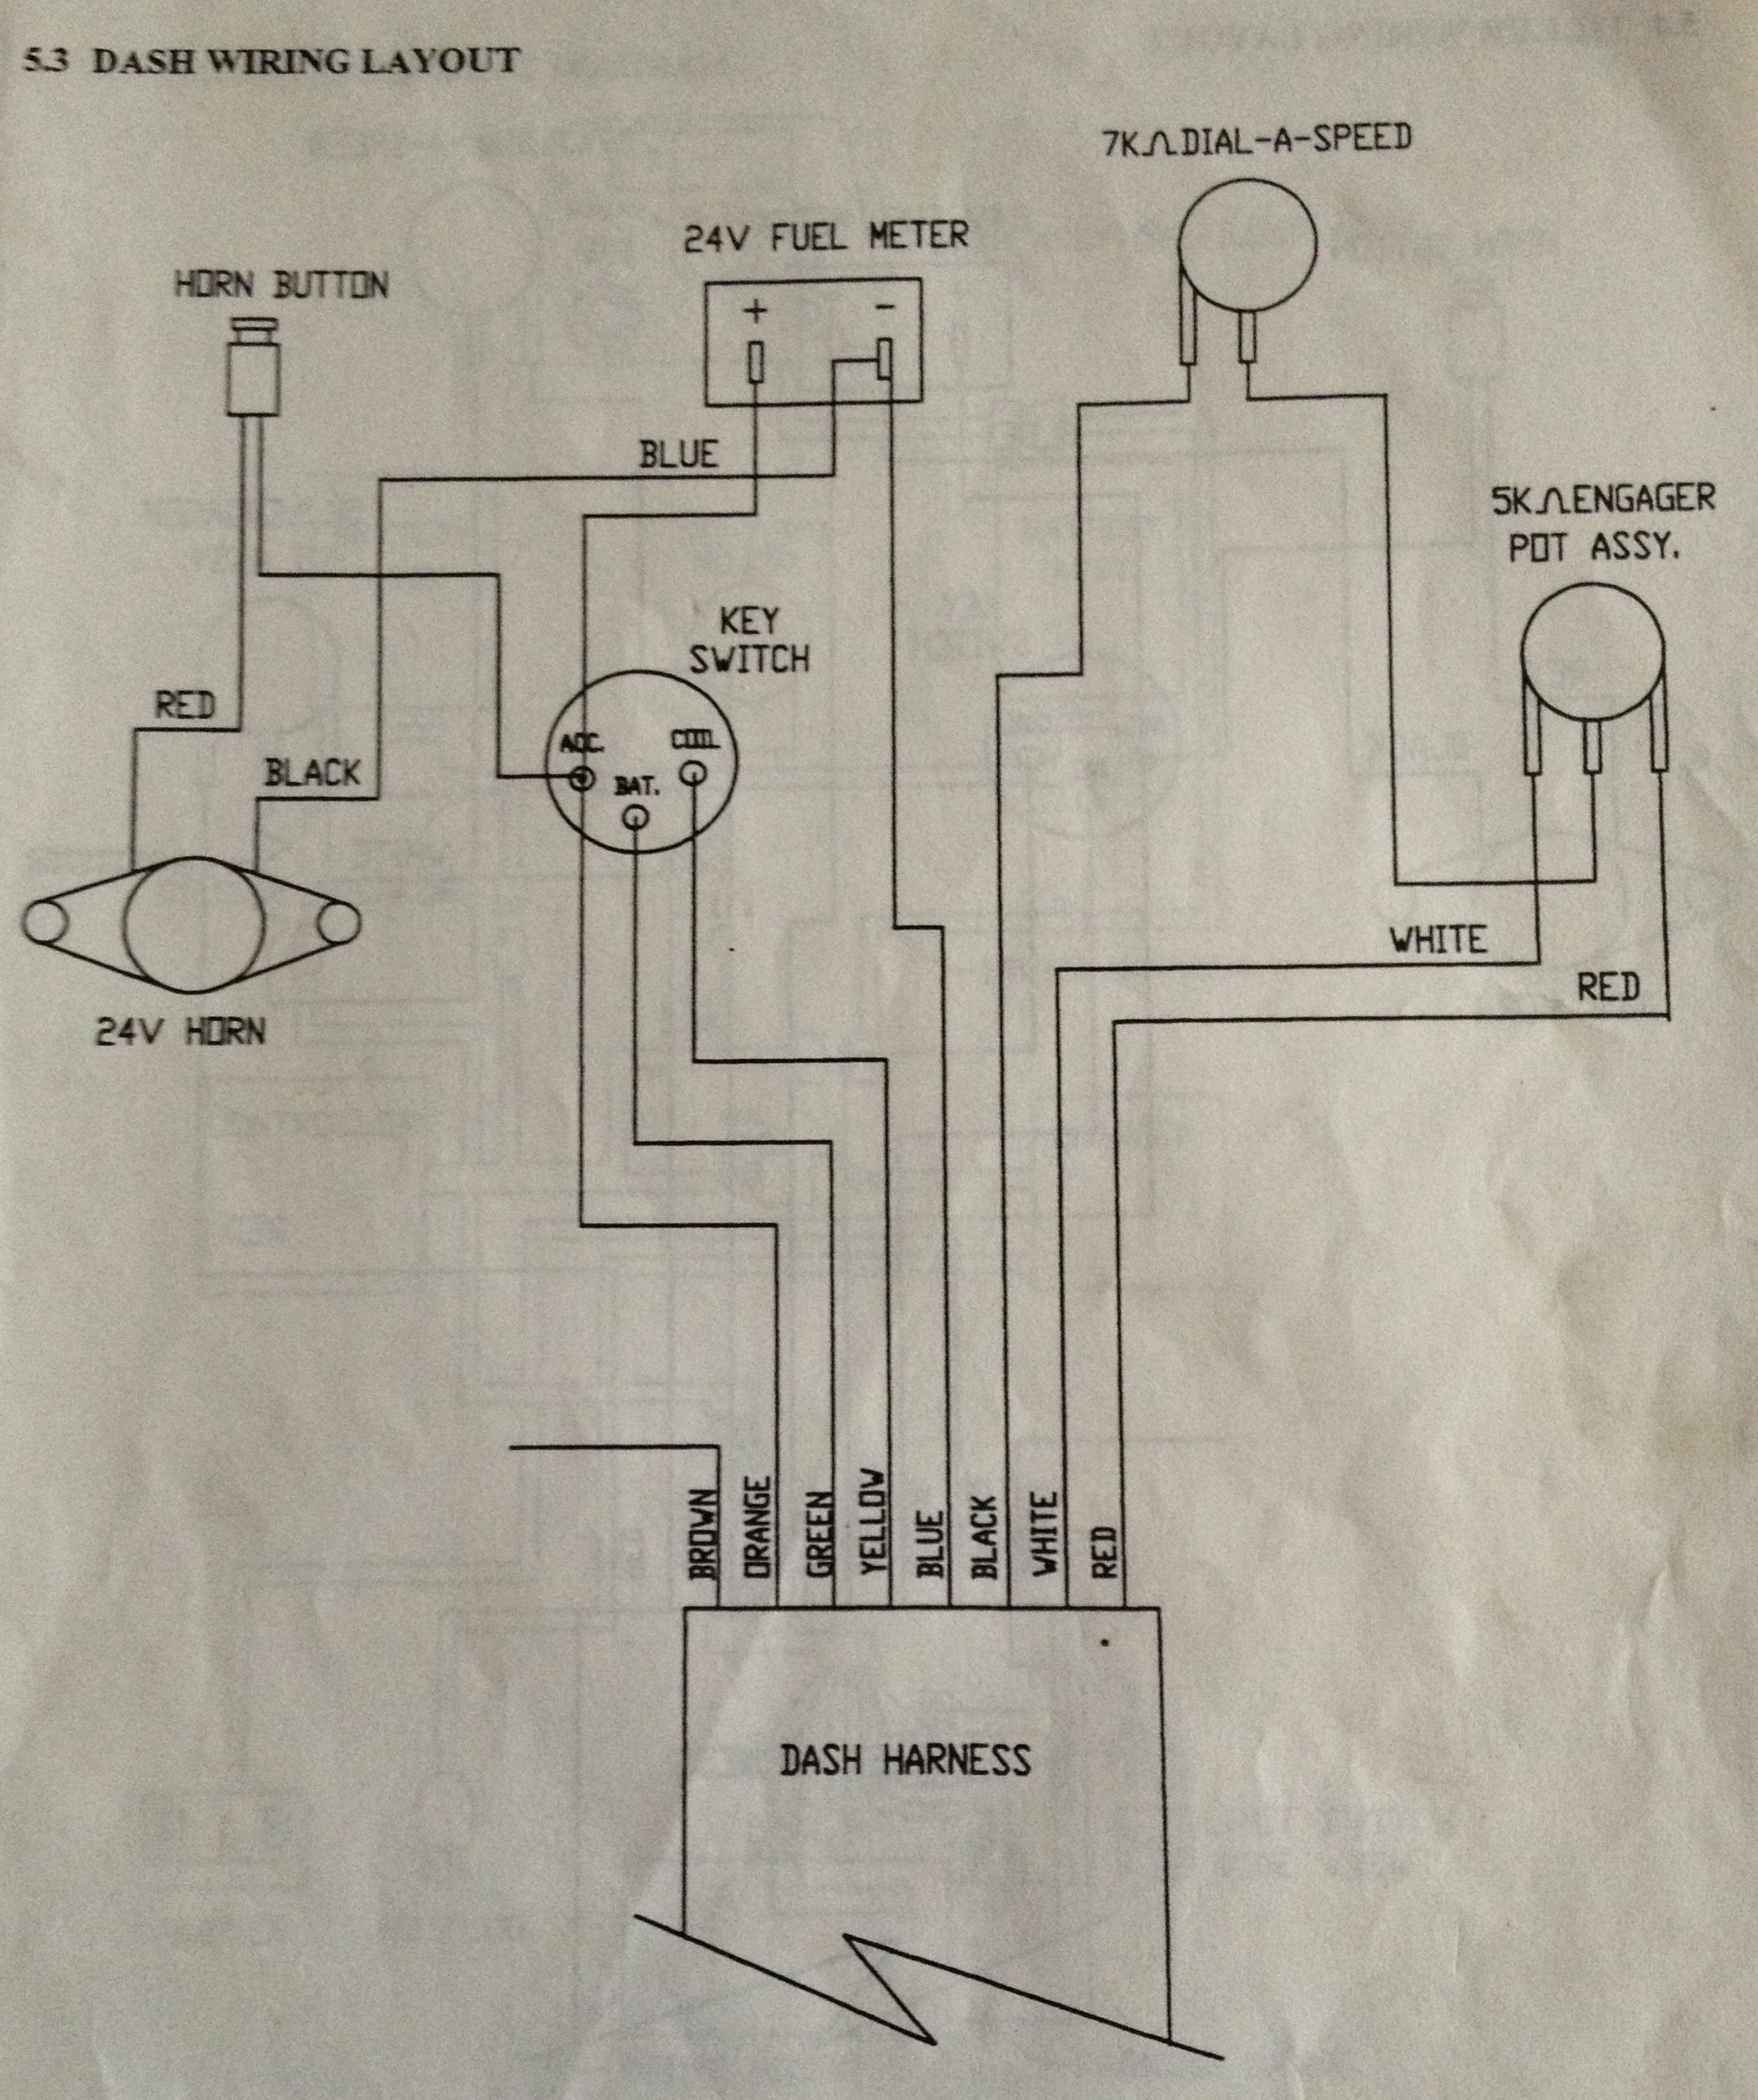 Lark Scooters Wire Diagram - lair.kobe.seblock.deDiagram Source